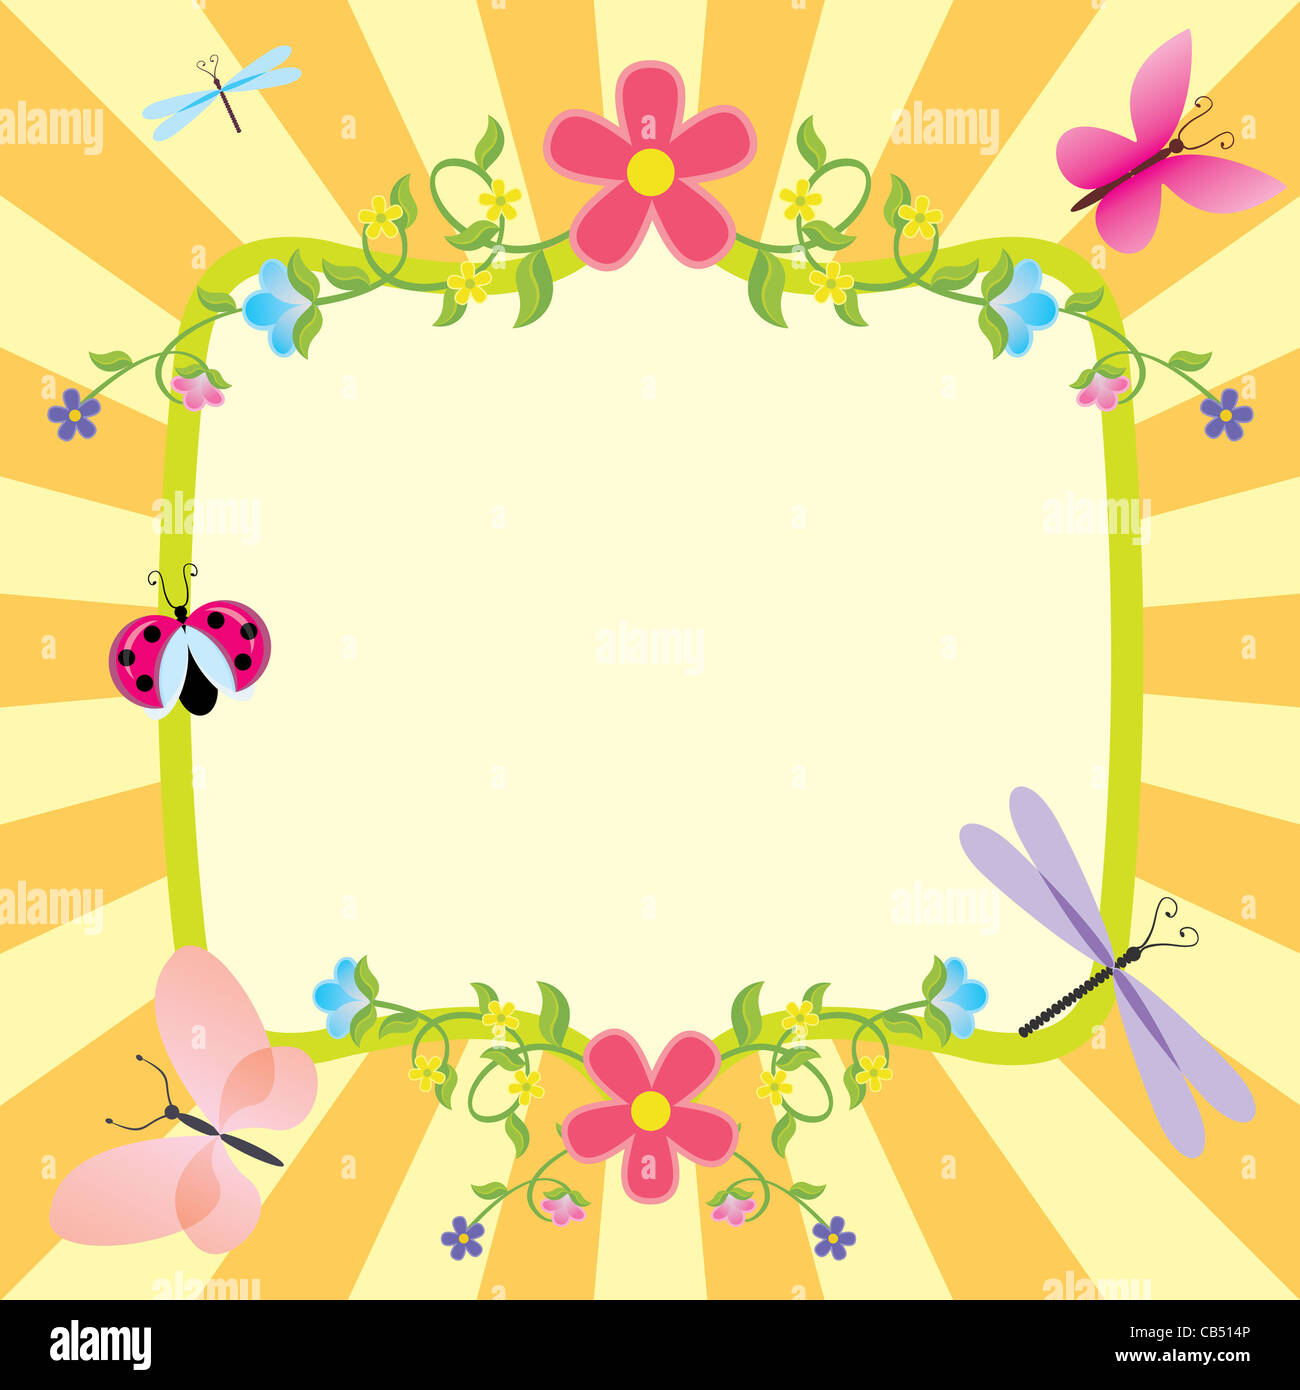 Bastidor de dibujos animados o primavera verano la pascua Imagen De Stock